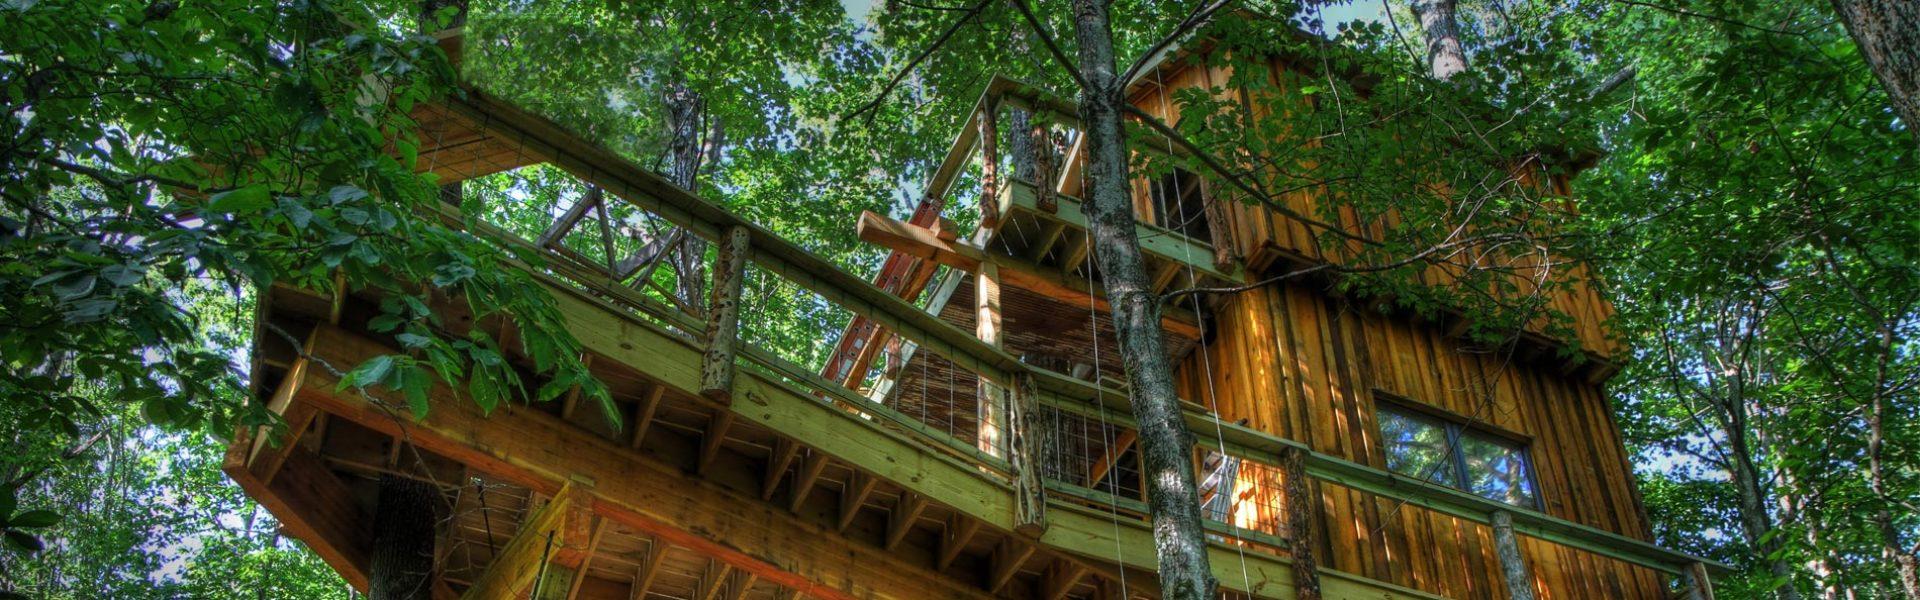 World Treehouses of Asheville NC